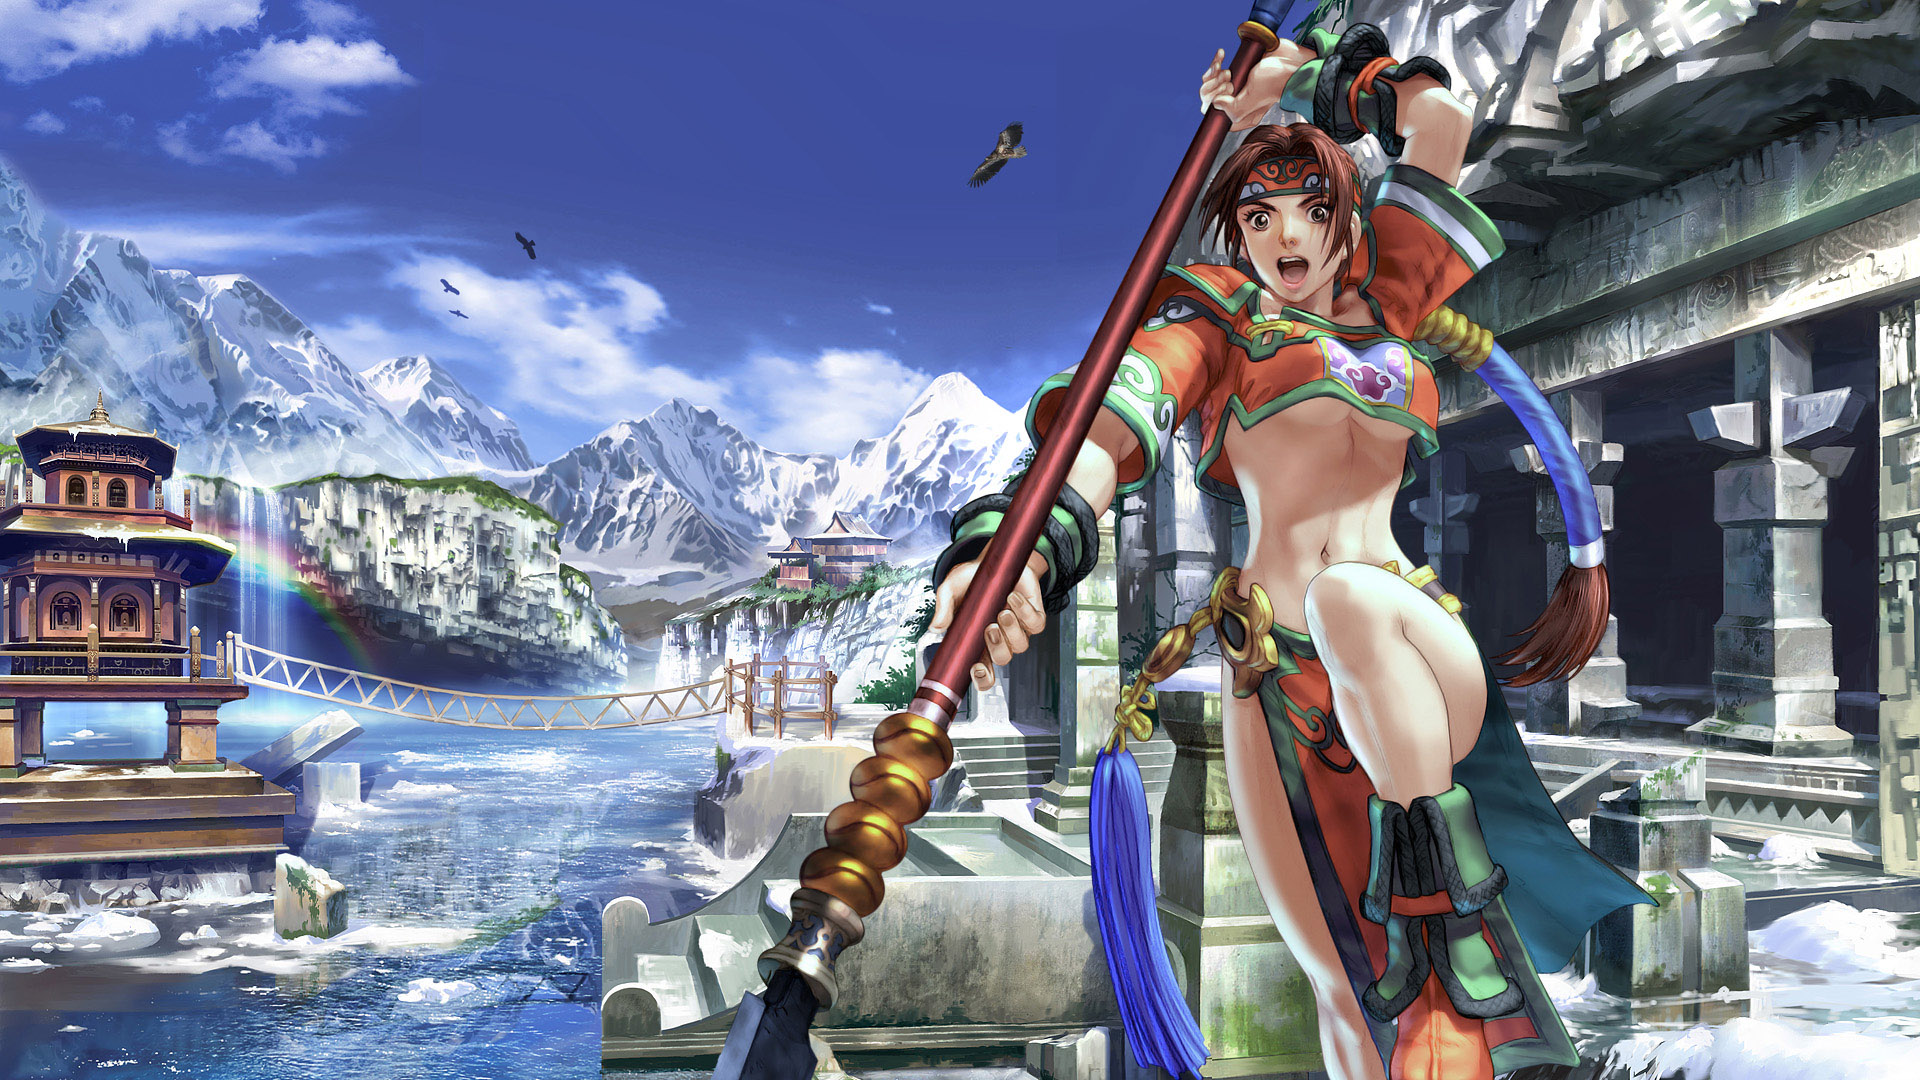 Sadistic game fantasy nackt pics